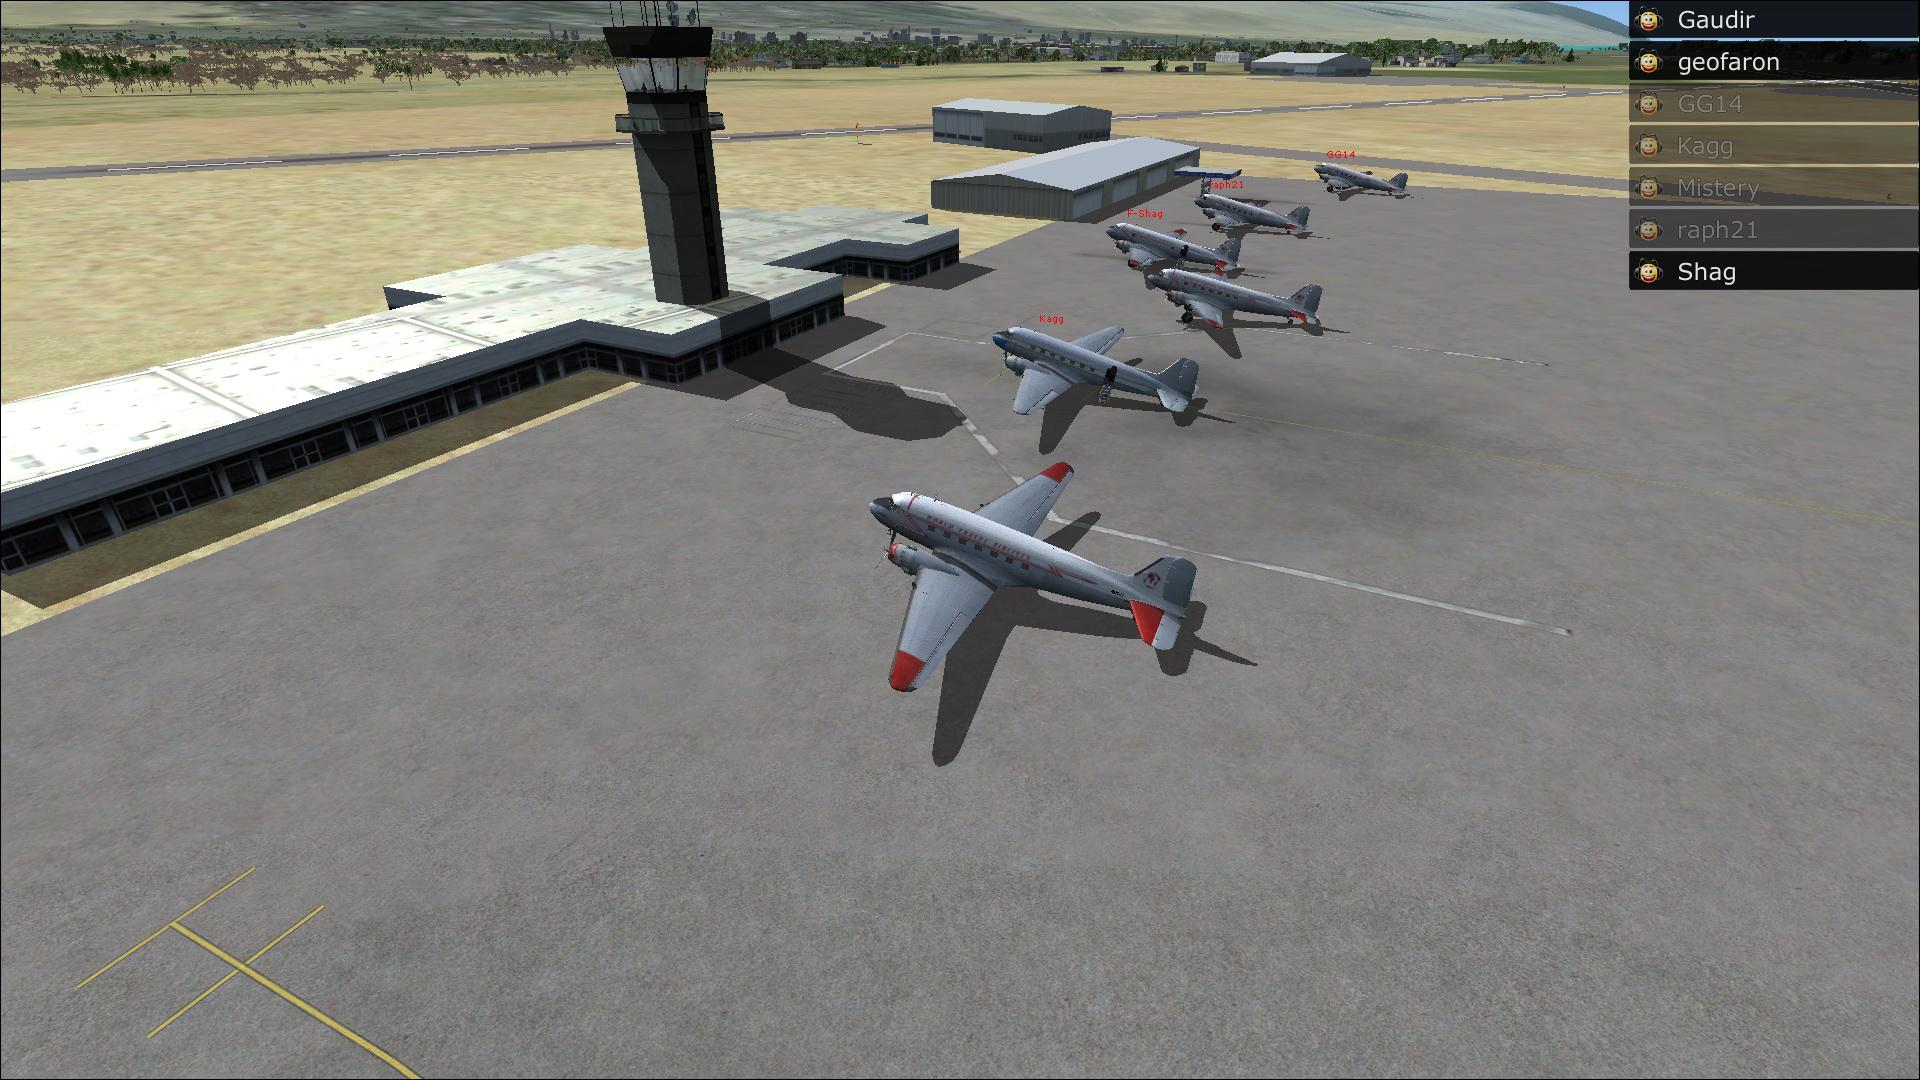 Vol en formation en Afrique (DC3) 35414820132222313558